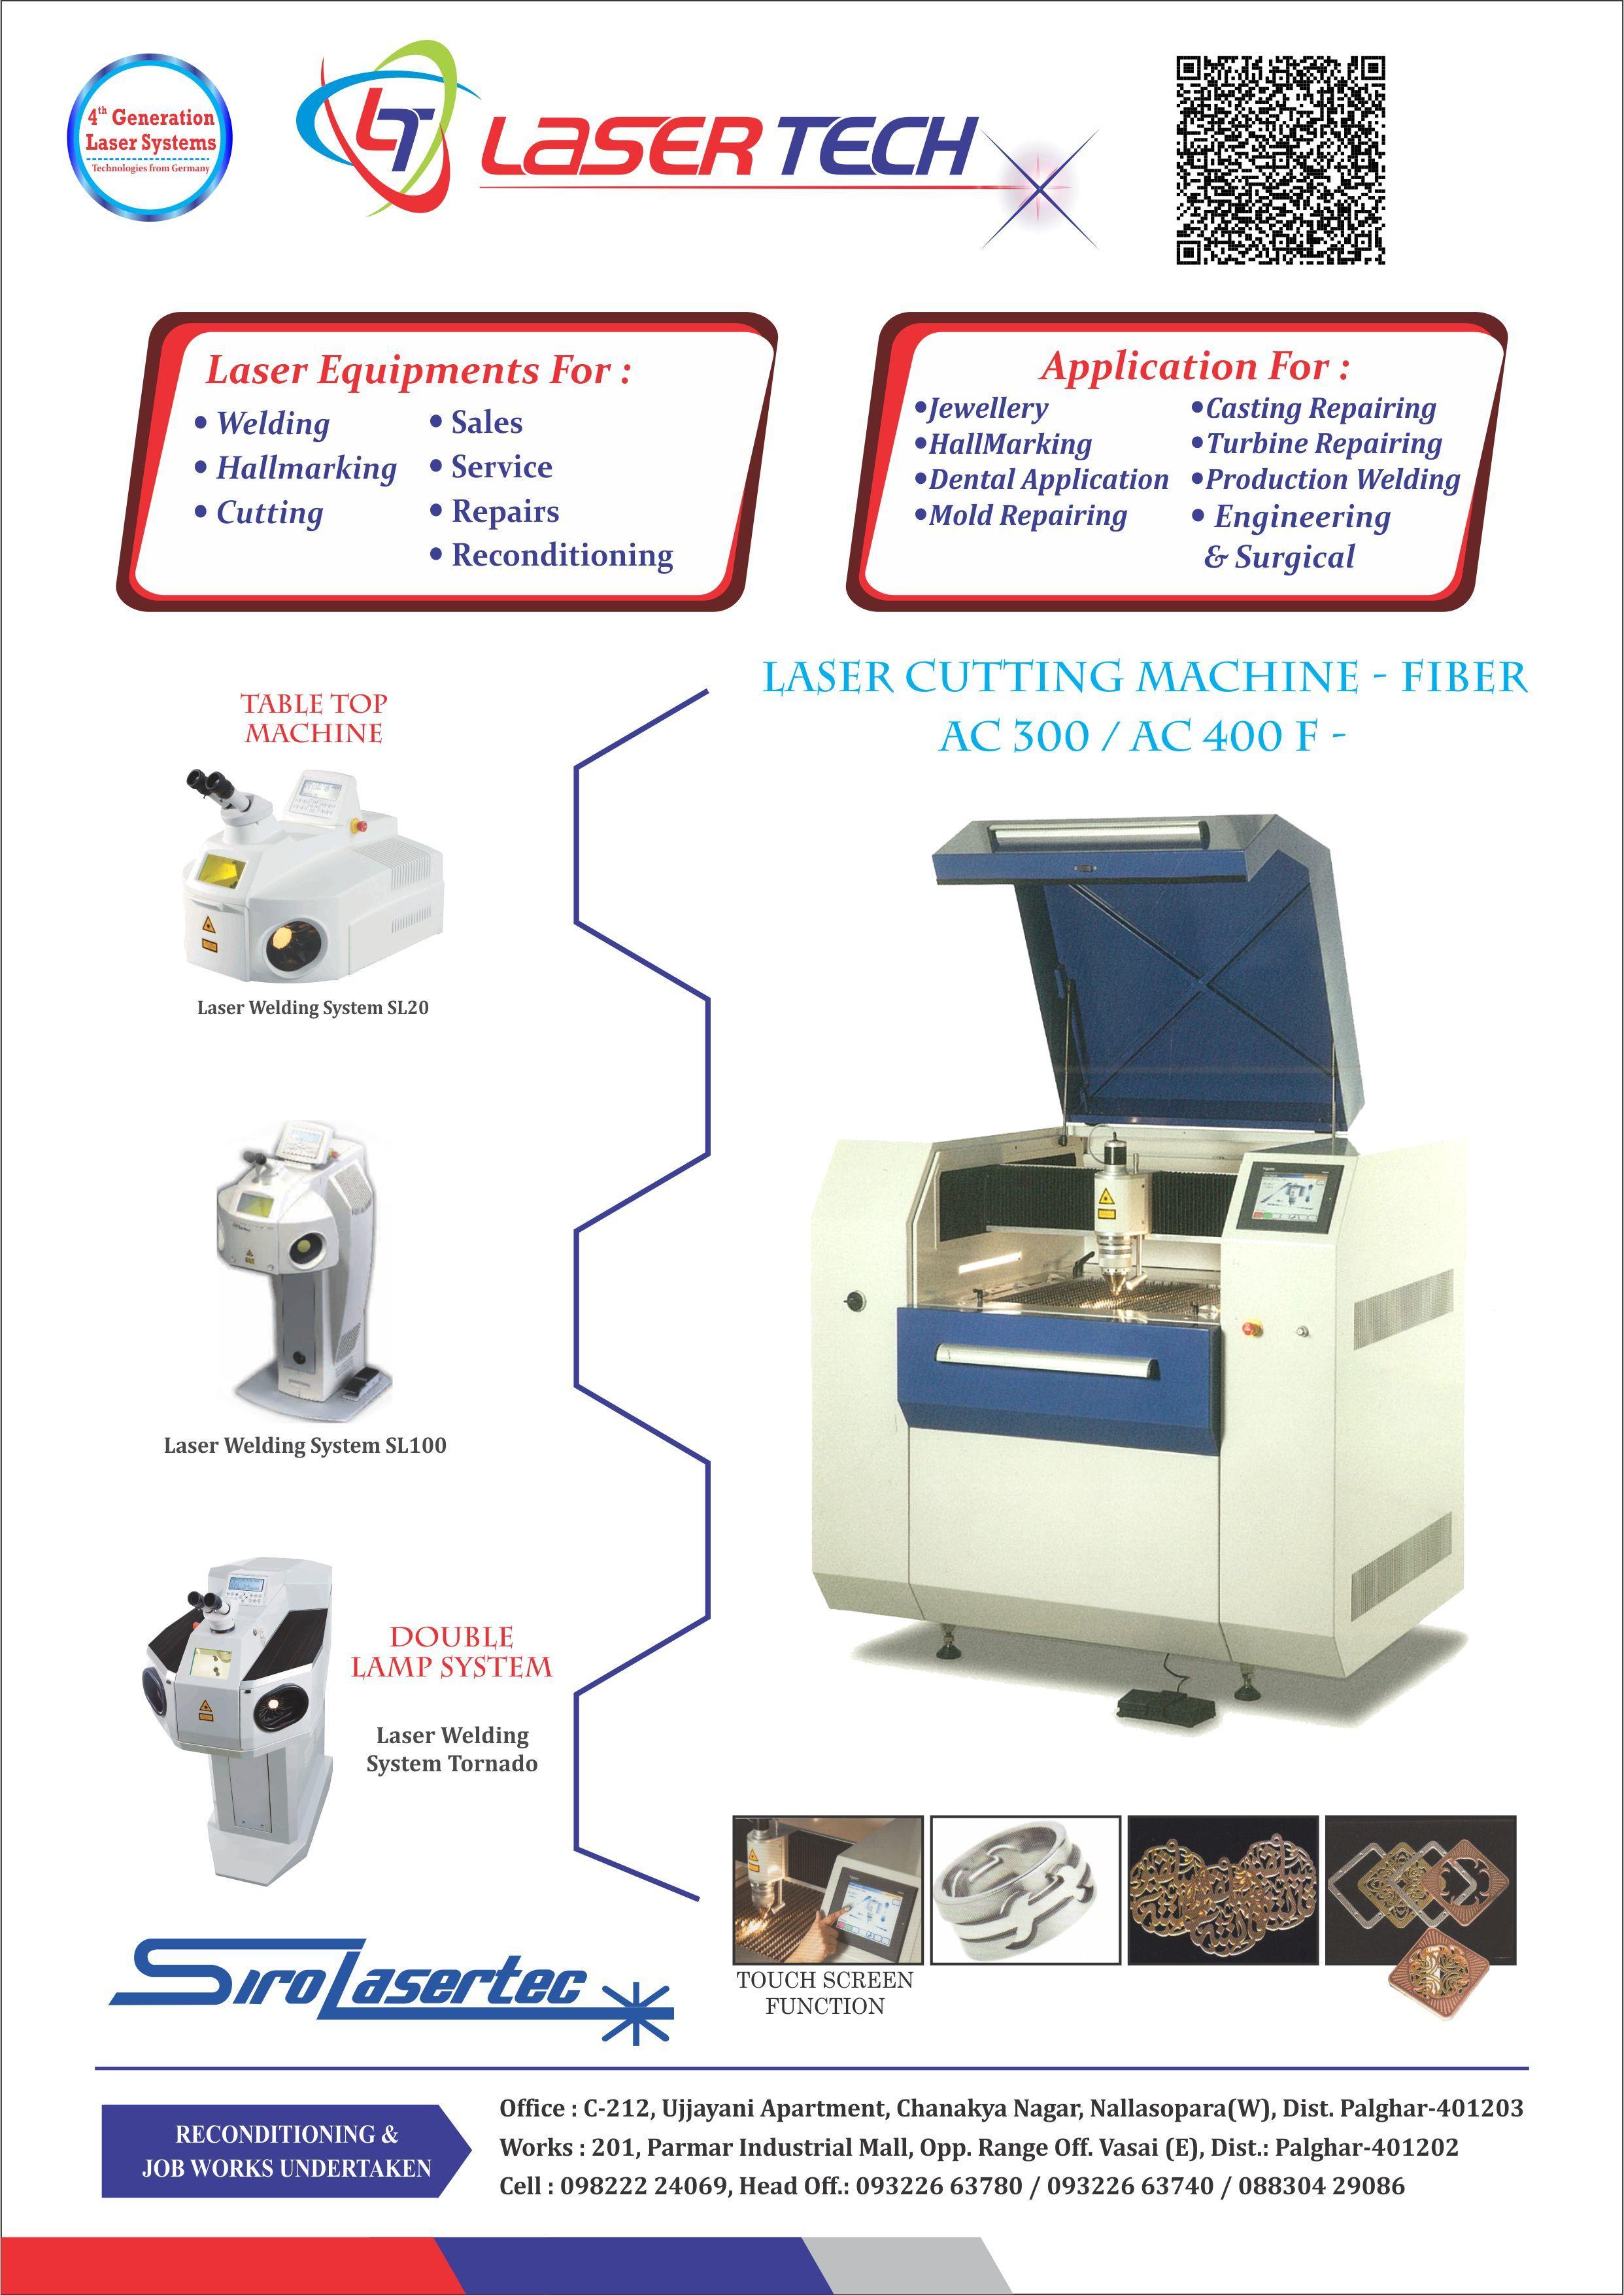 3D PRINTING MACHINES / MODELS